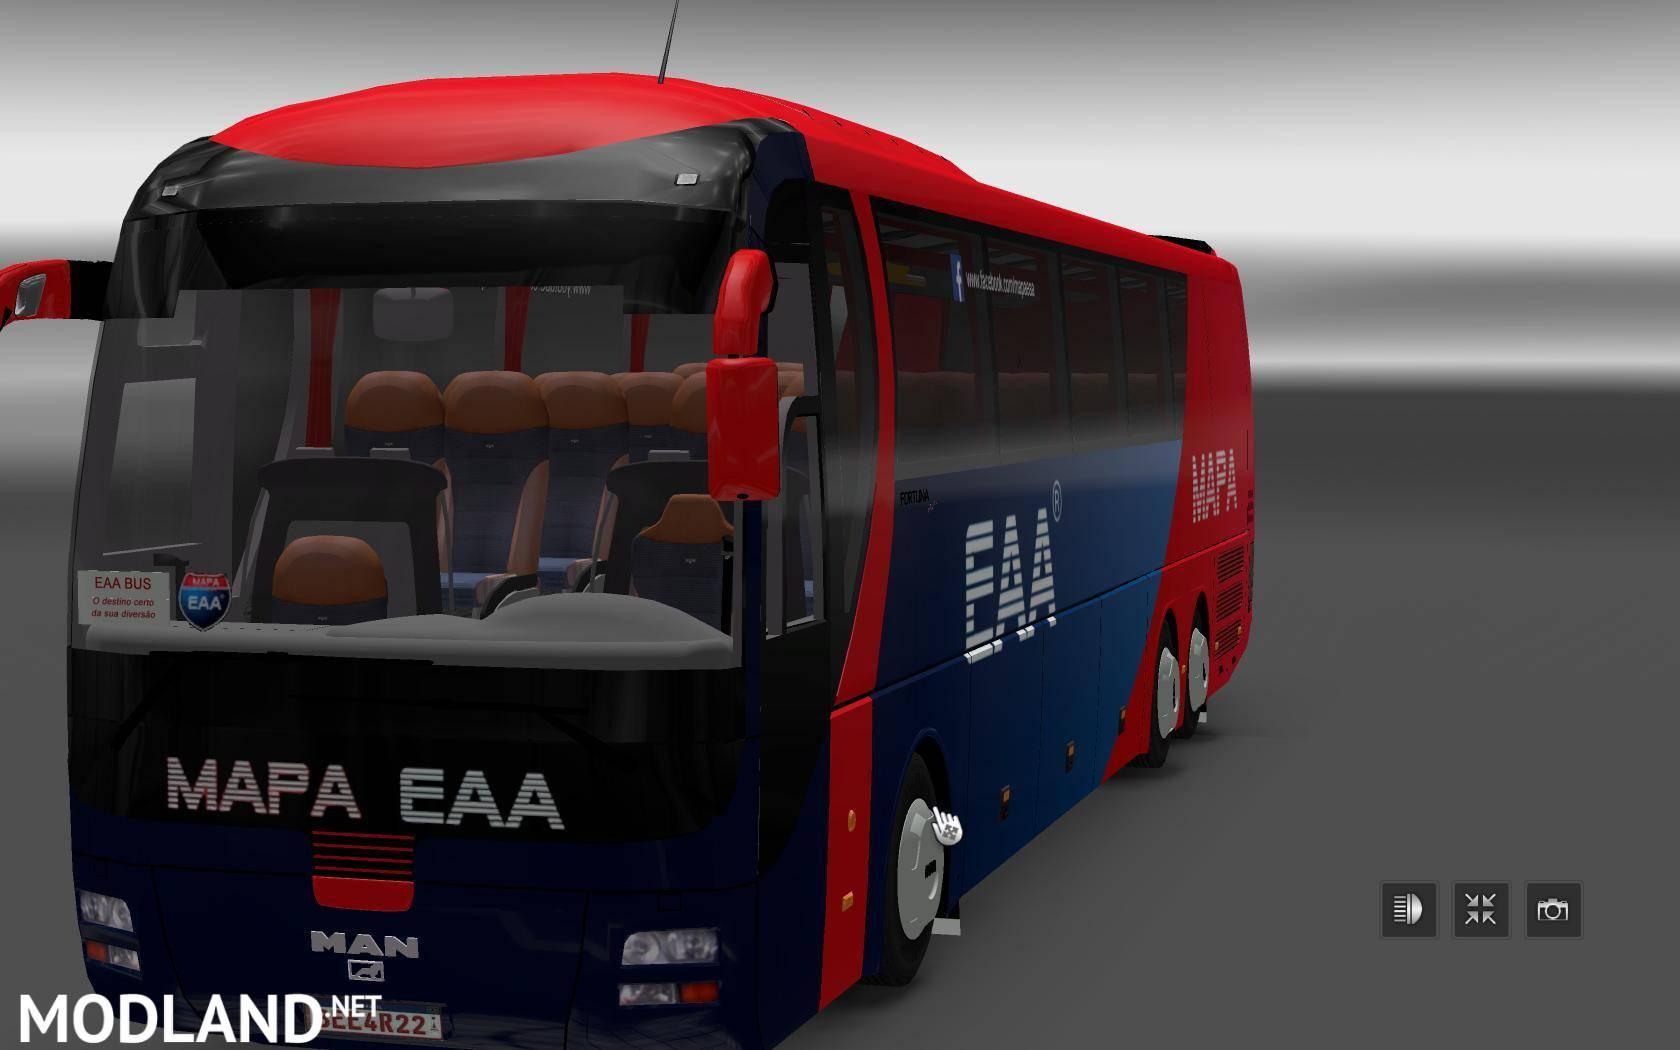 Eaa Map Bus Version V4 2 06 1 27 Mod For Ets 2